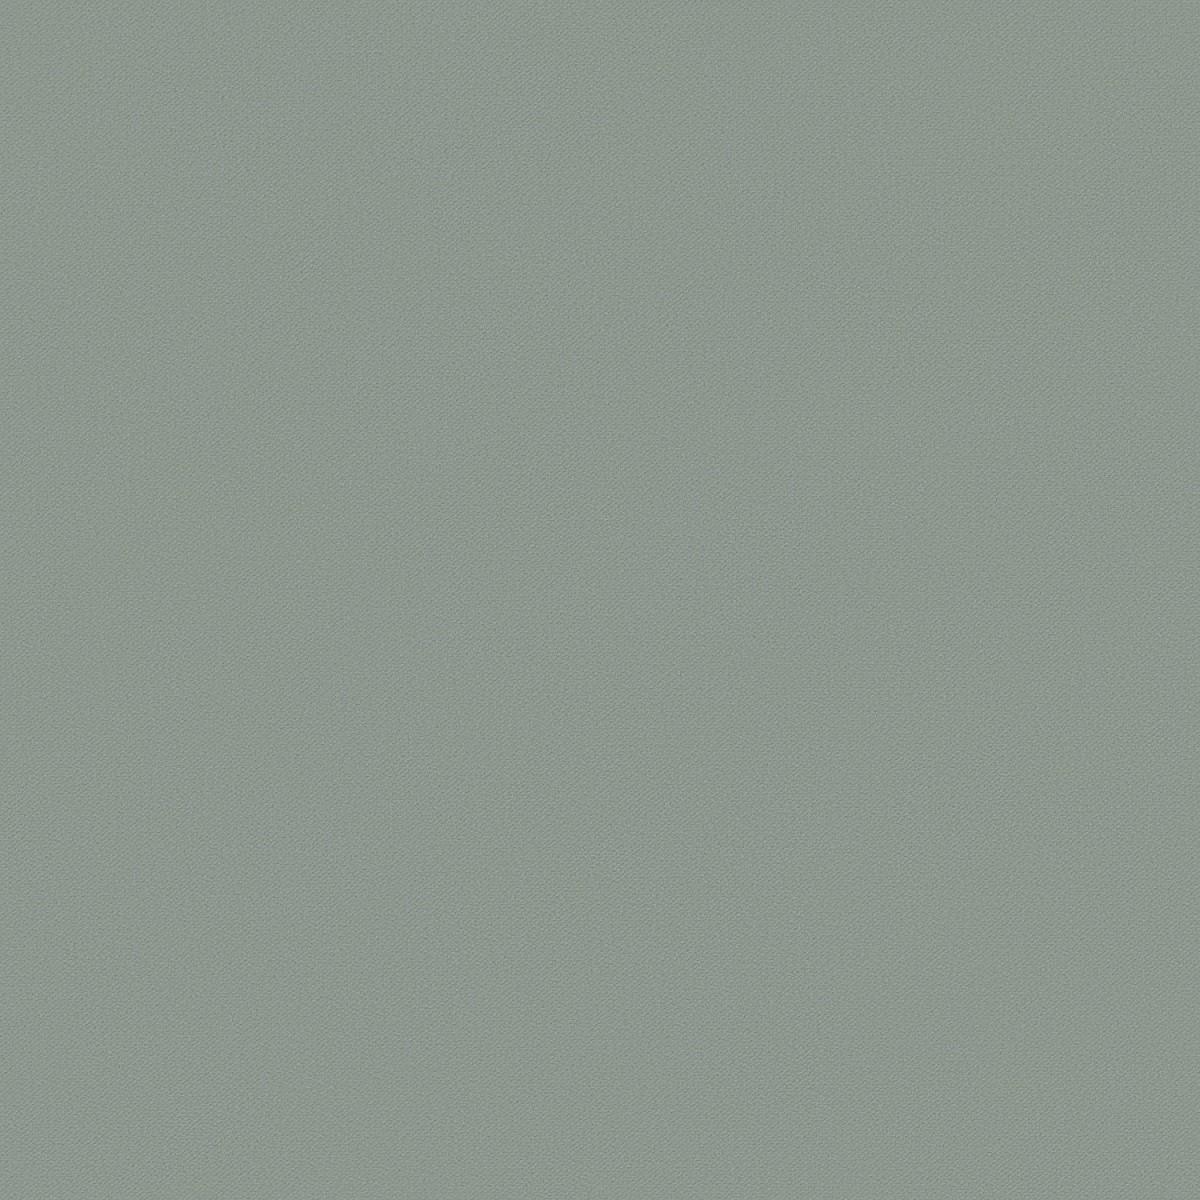 Besitzbar Sitzbank MUGGE - Kissen himmelblau